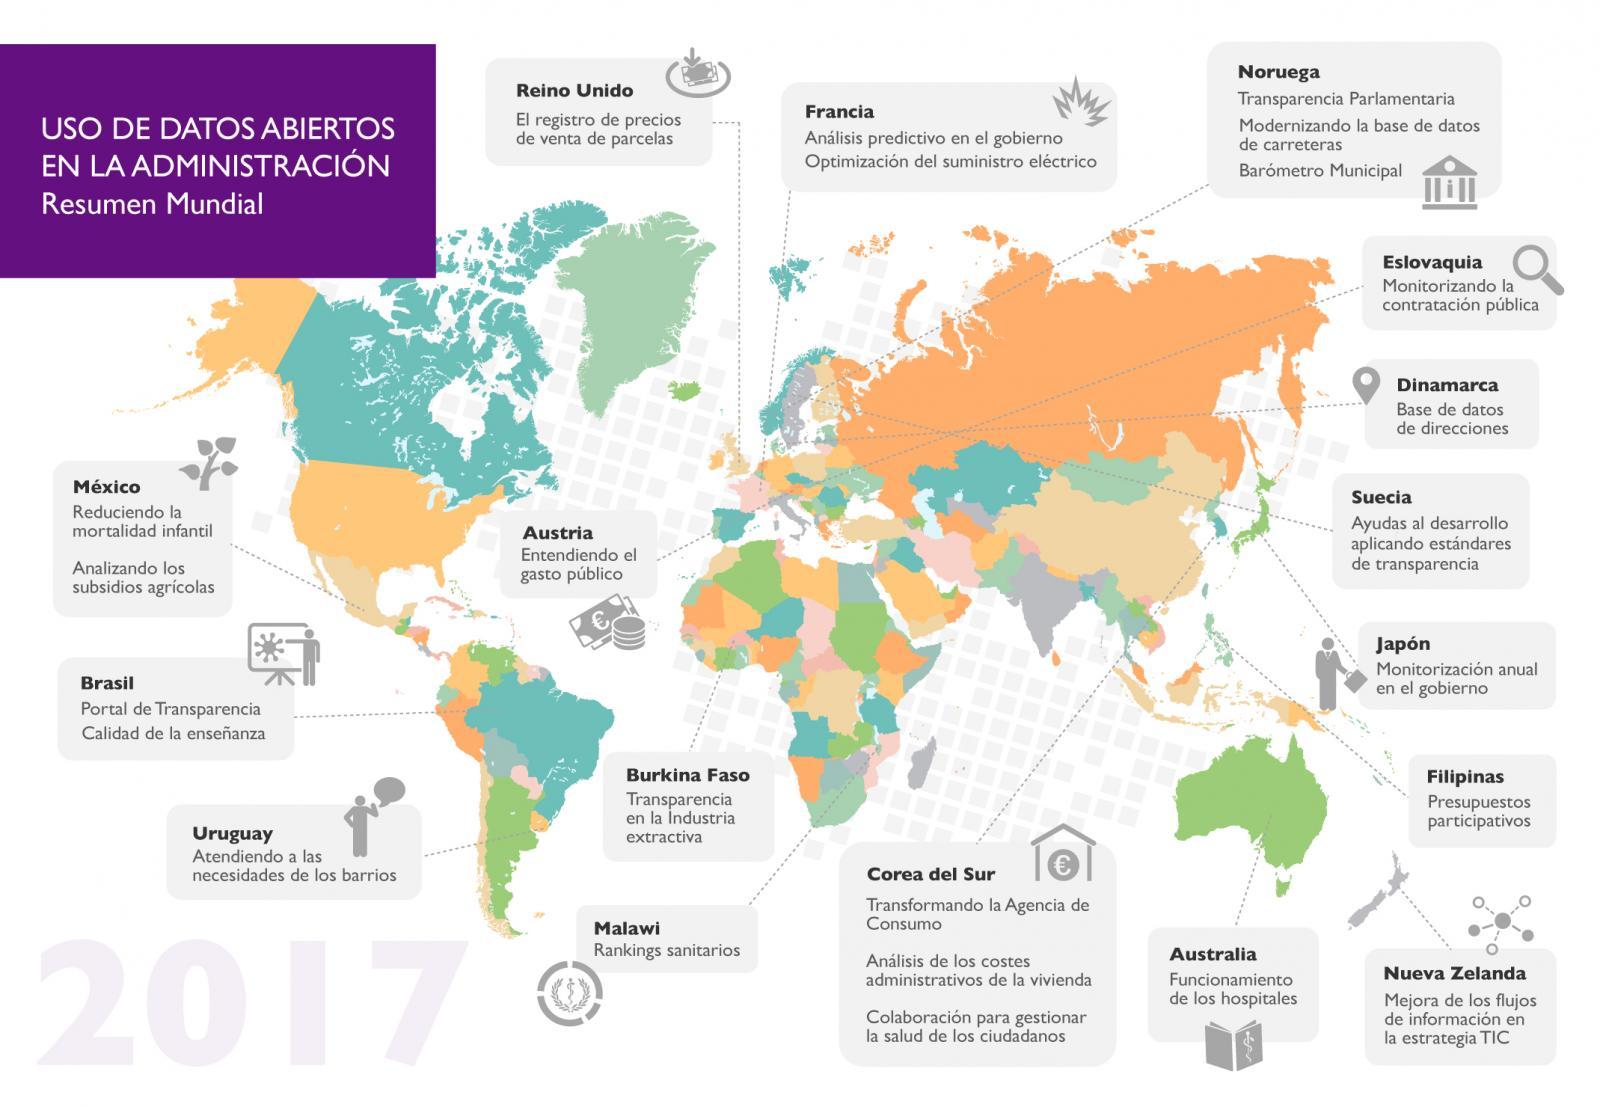 mapa mundial, uso datos abiertos, administración